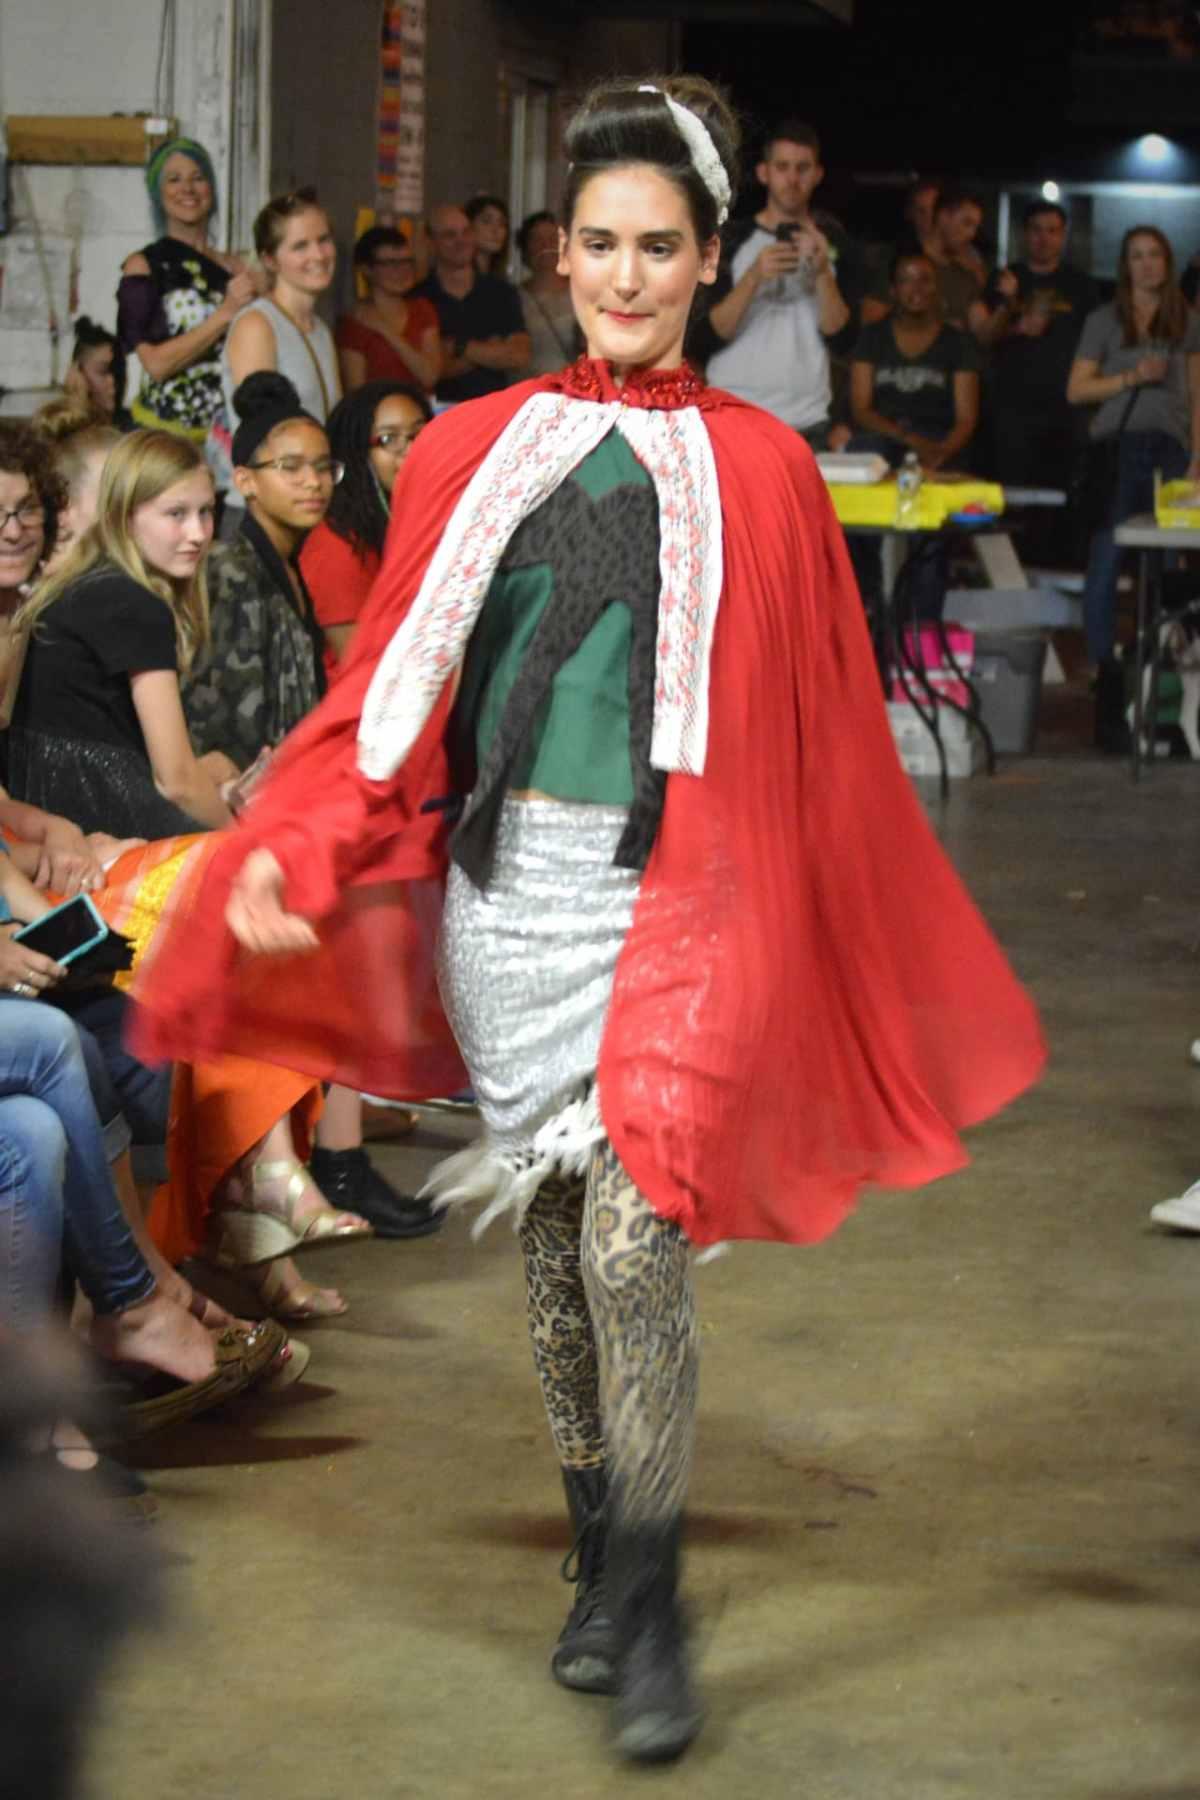 Thrift Store Runway show raises money for the Bib & Tucker Sew-Op